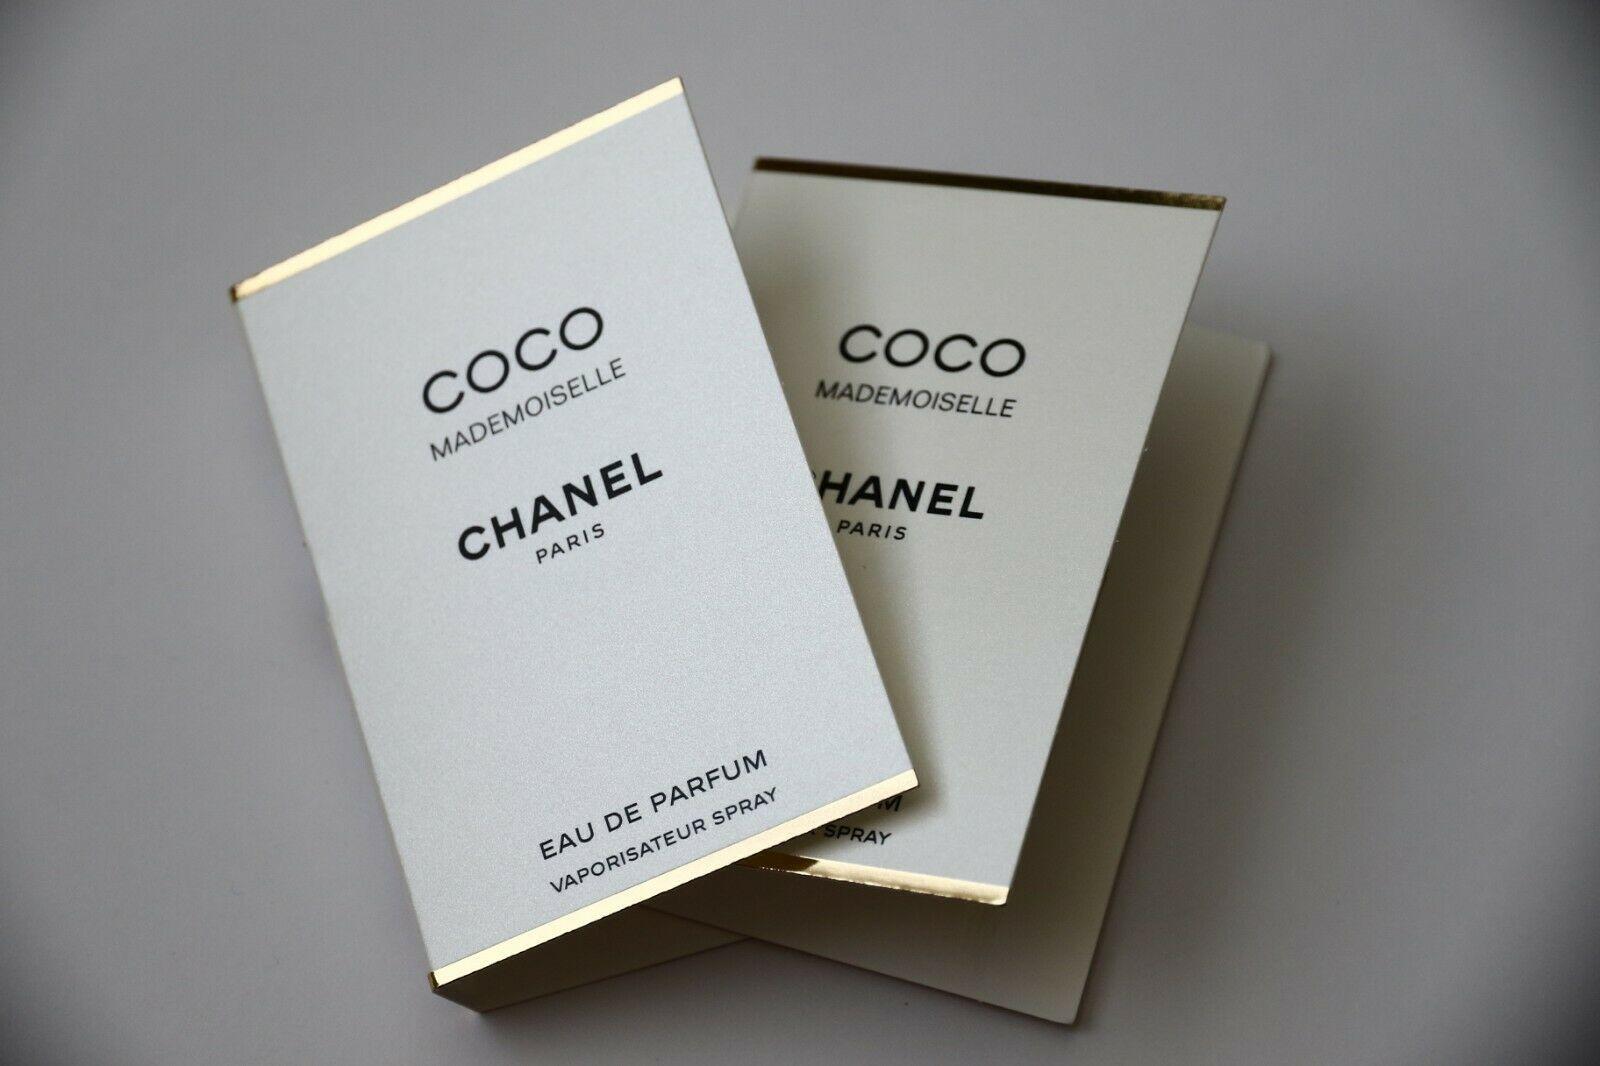 2 x Chanel Coco Mademoiselle Eau de Parfum Samples Spray EDP Perfume Lot